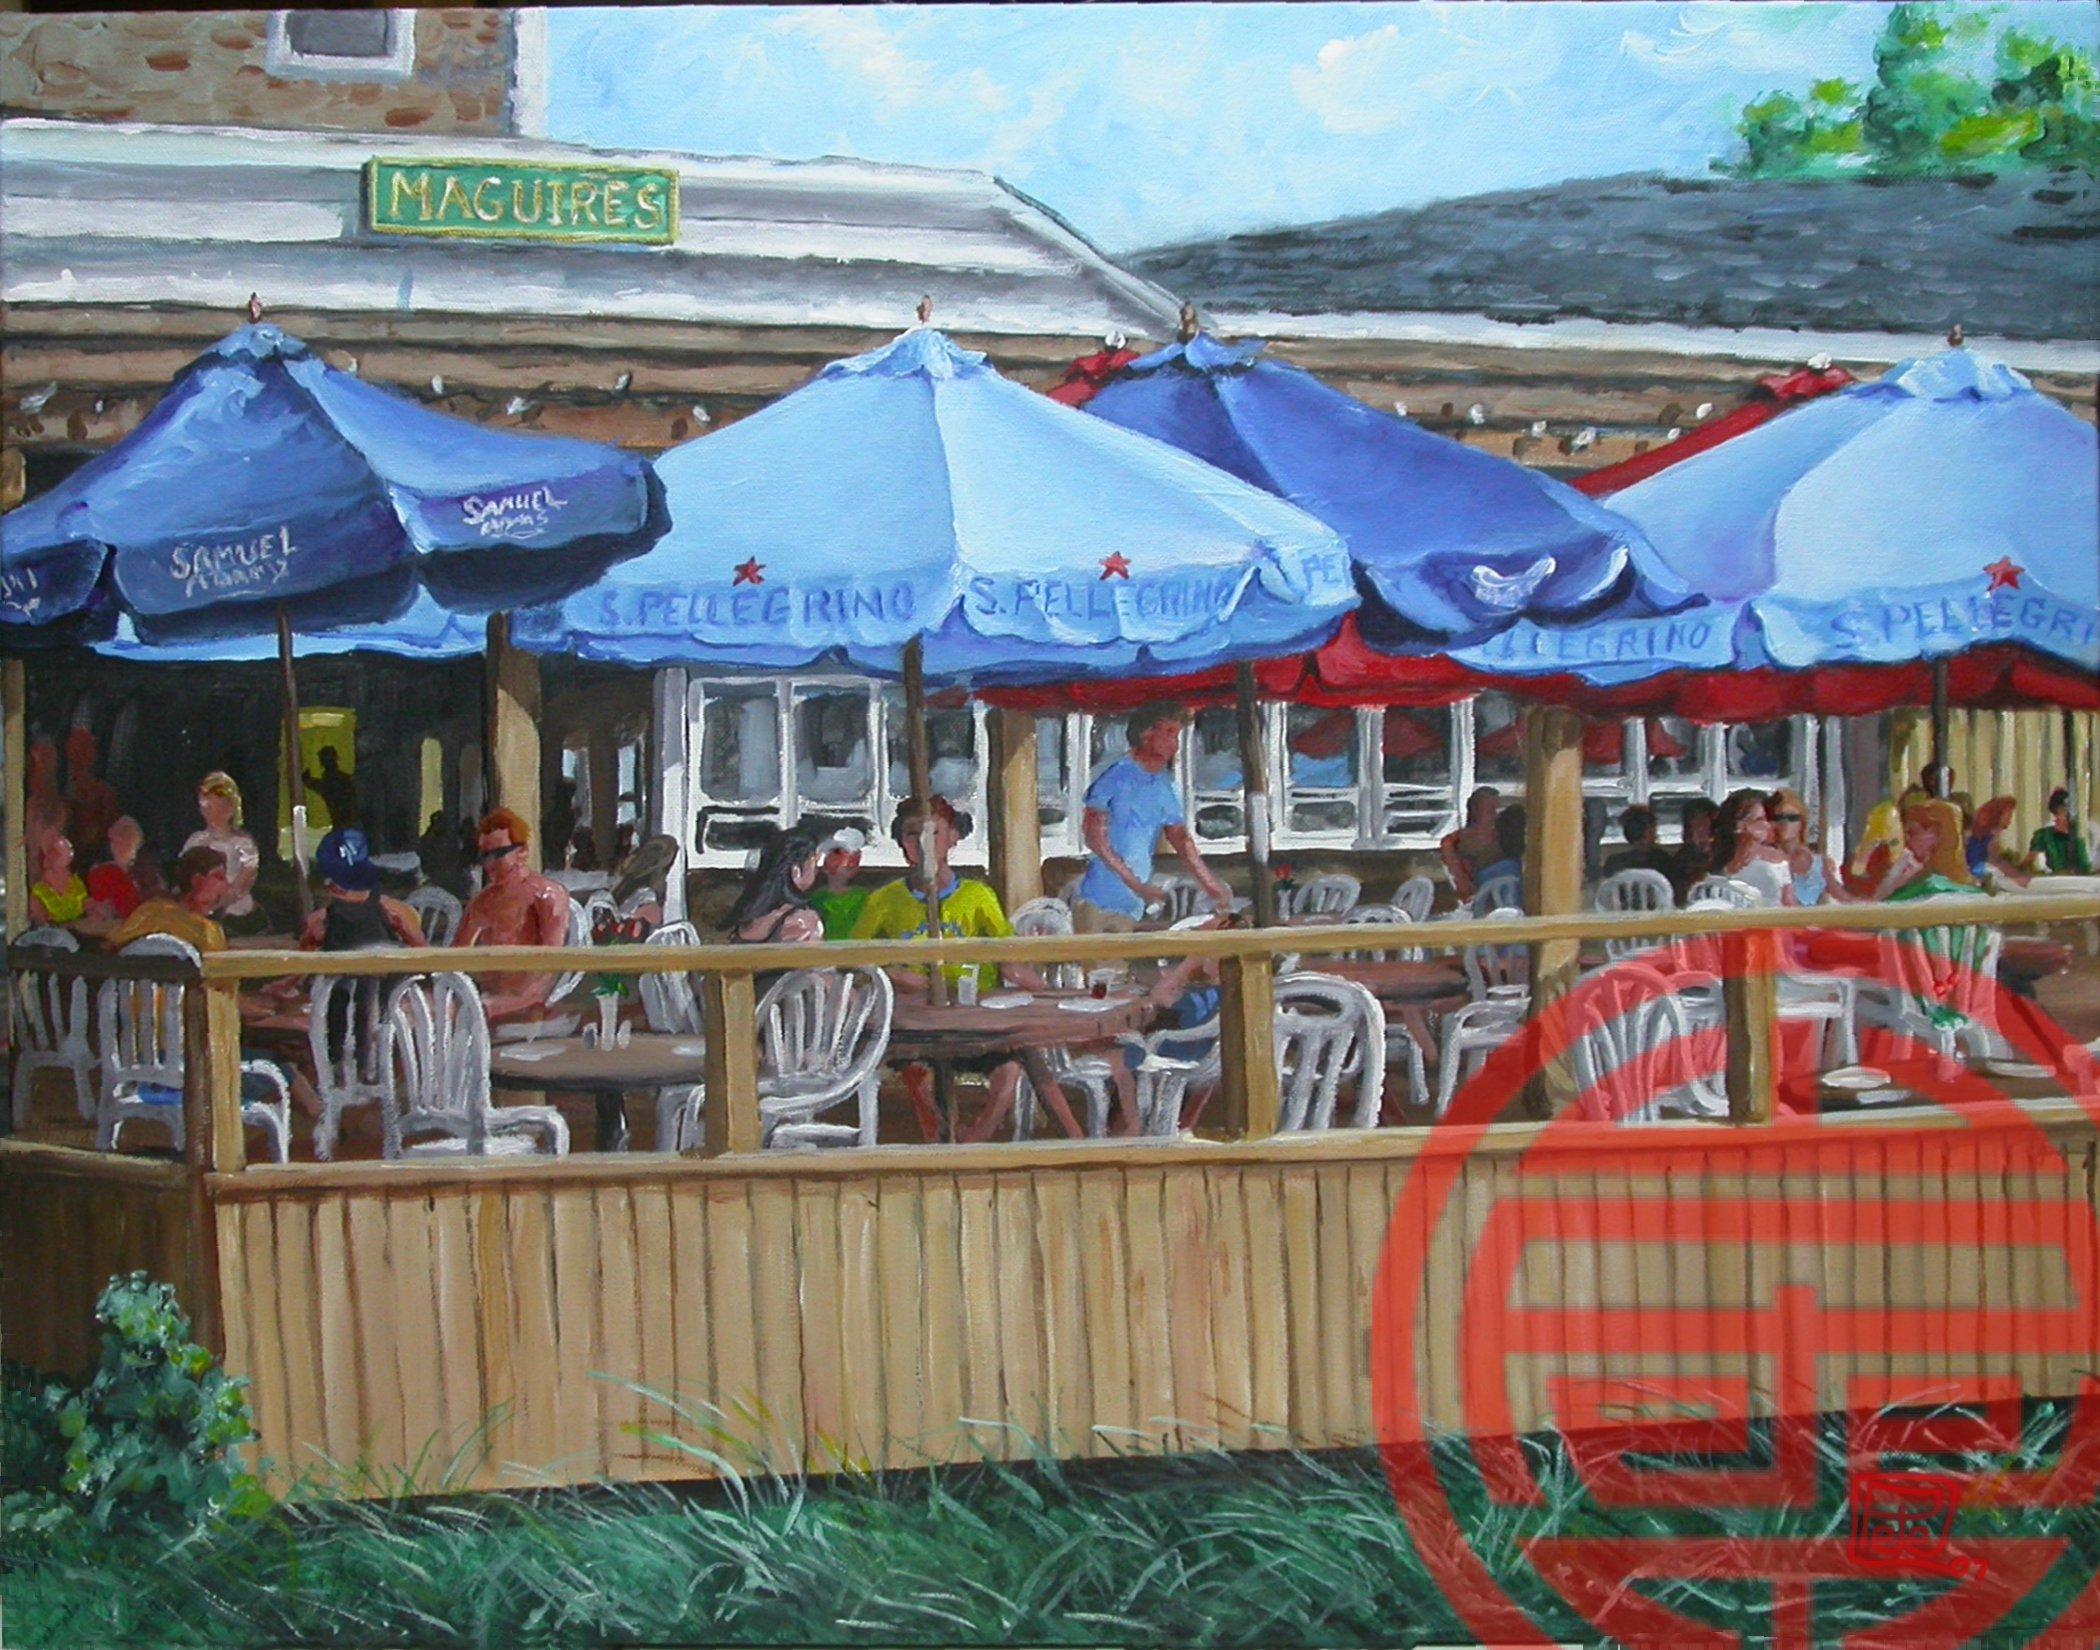 Maguires Restaurant Ocean Beach Fire Island By Peter Tartaglia